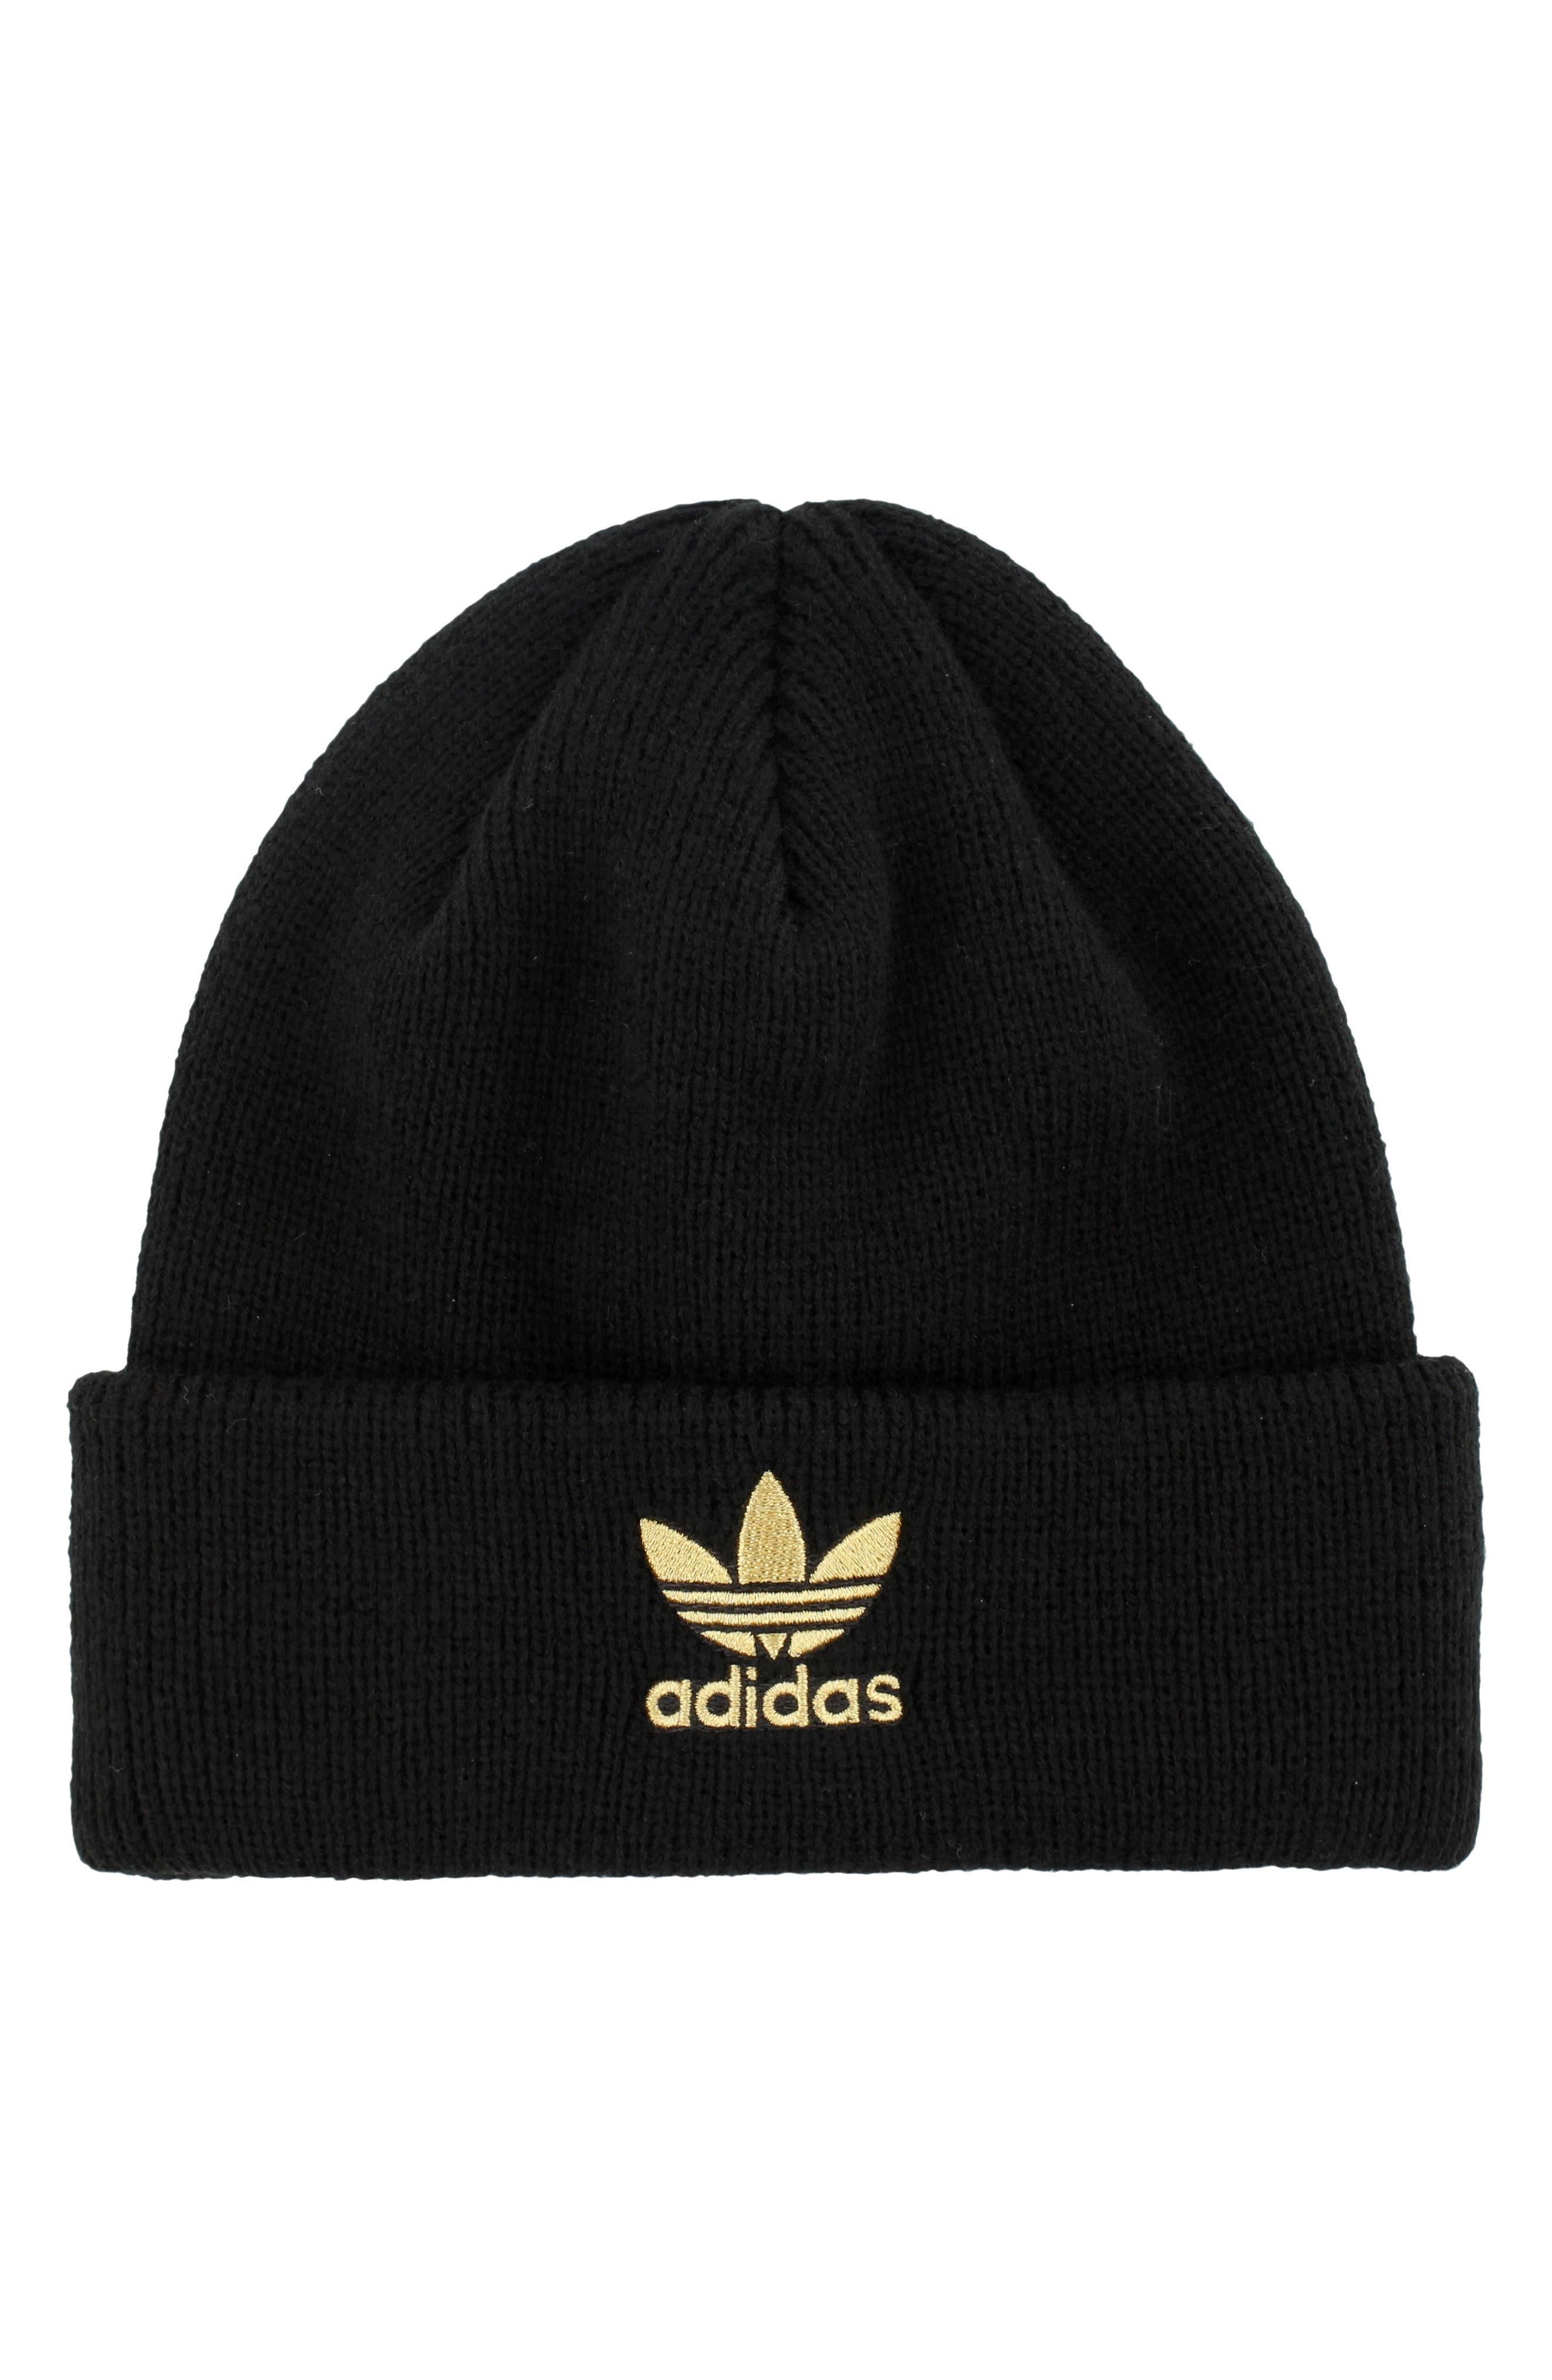 Adidas Trefoil Beanie - Black